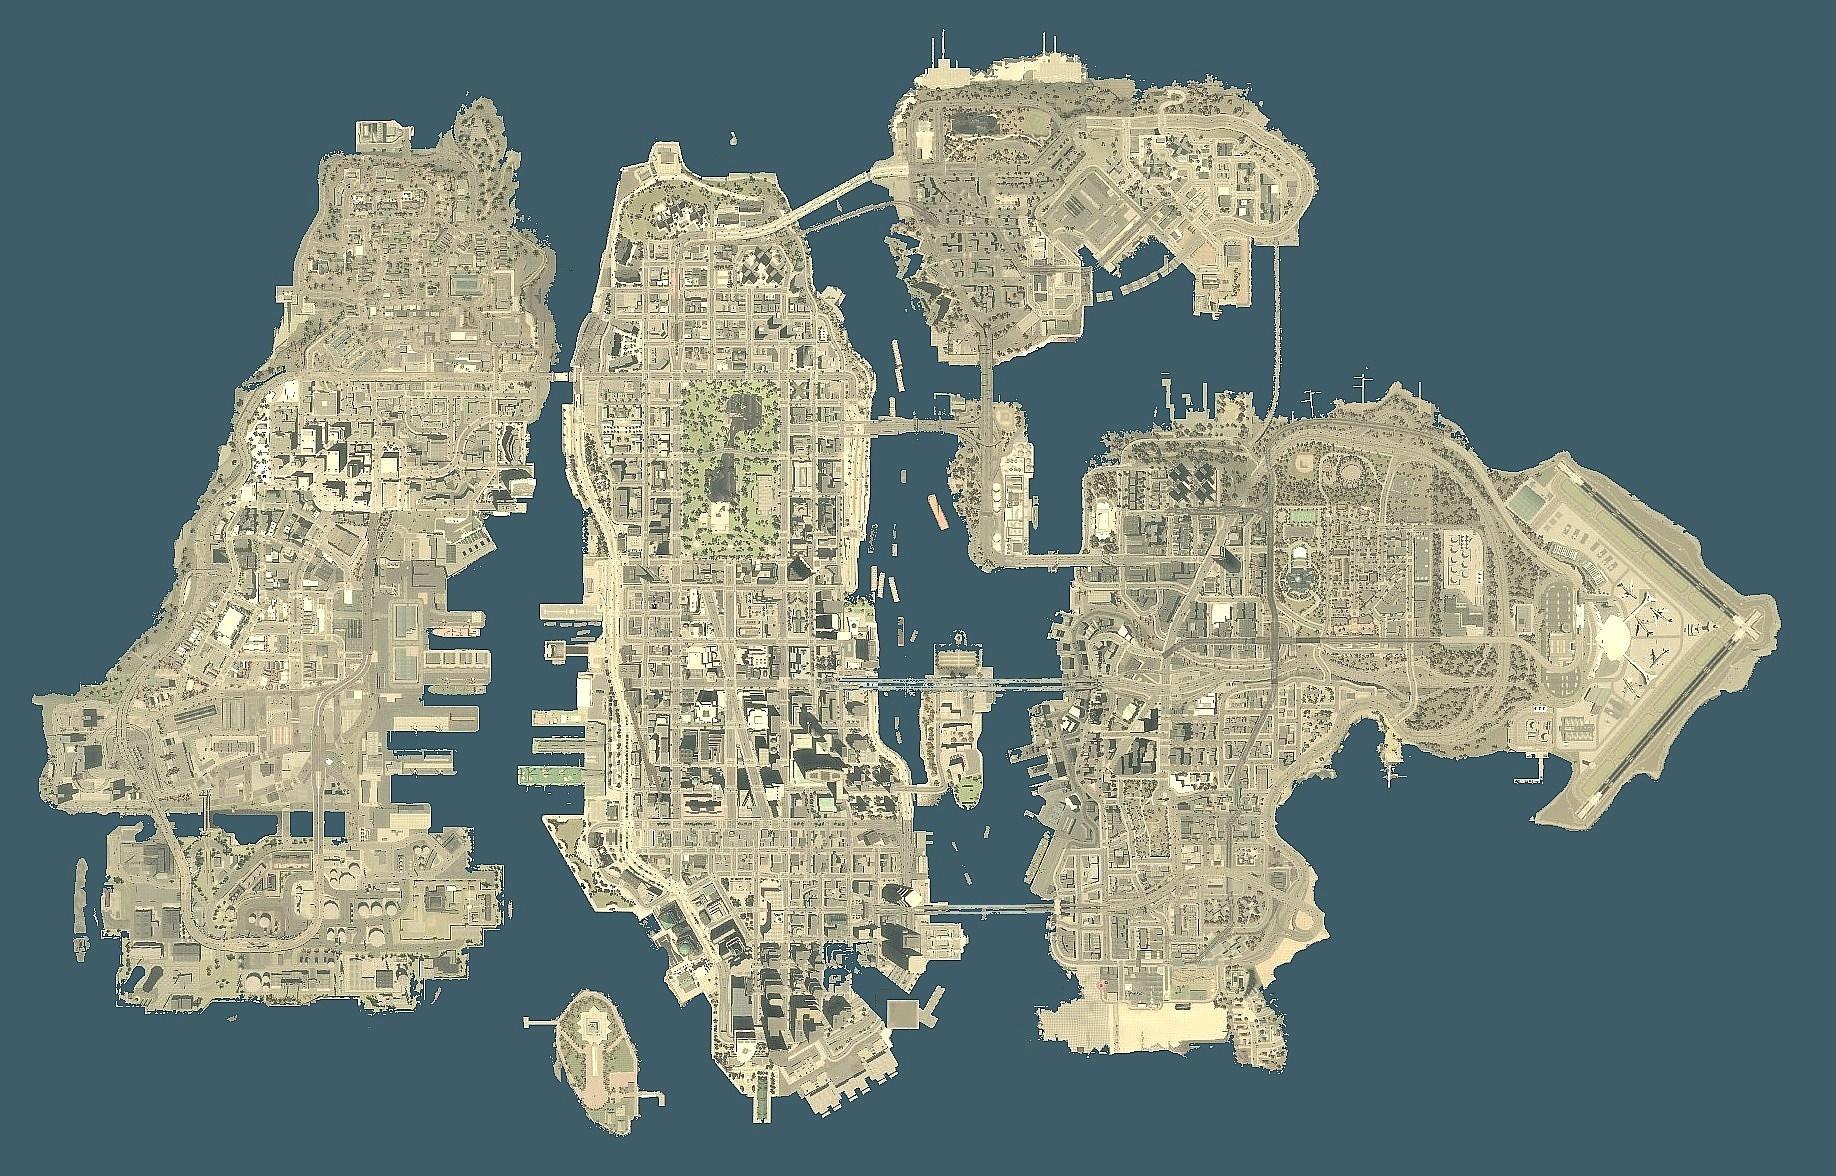 Gta 4 Karte.All Gta Map Size Comparison